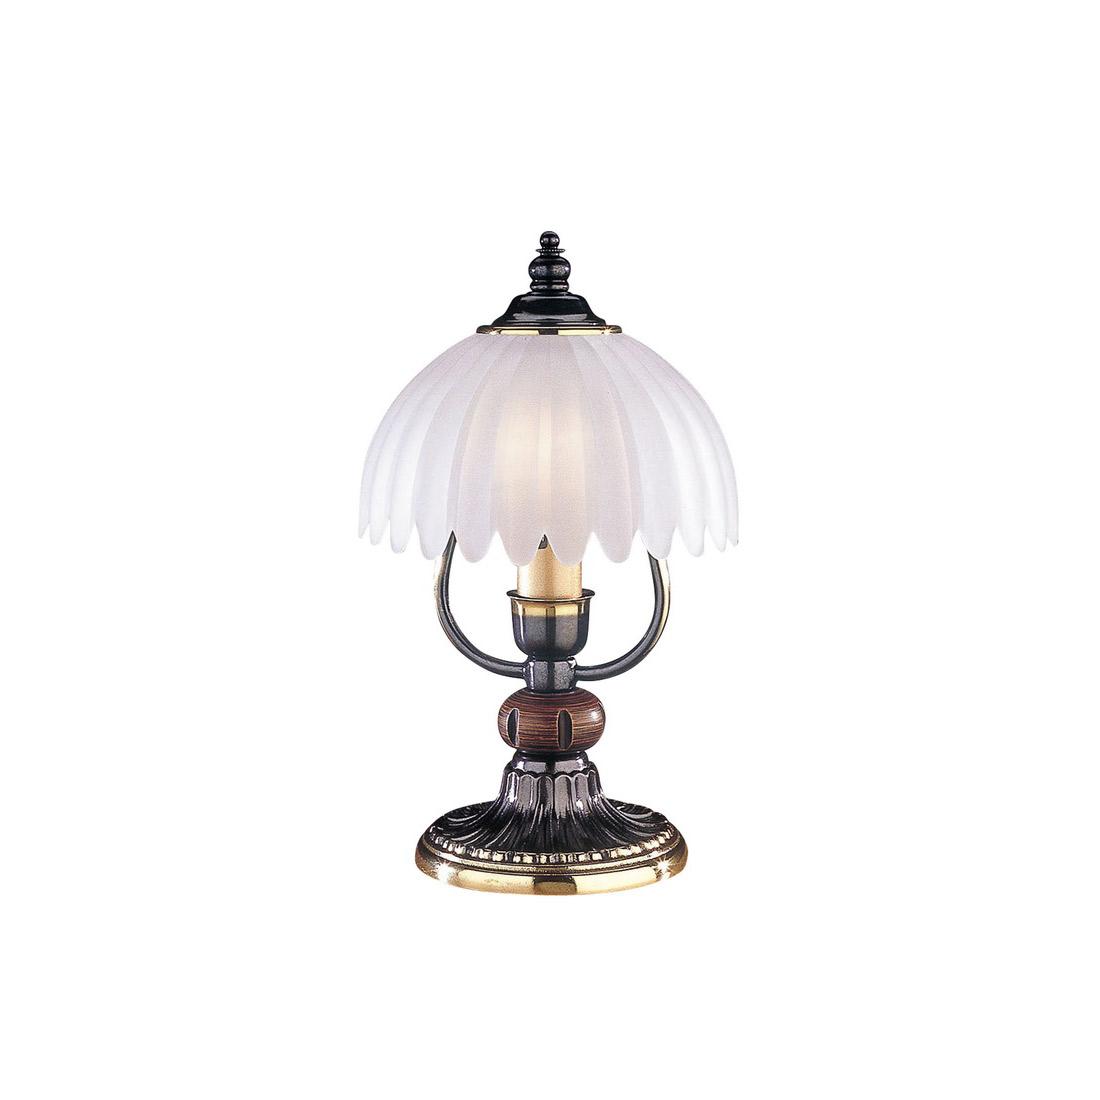 Настольная лампа Reccagni Angelo P 2805 цена и фото